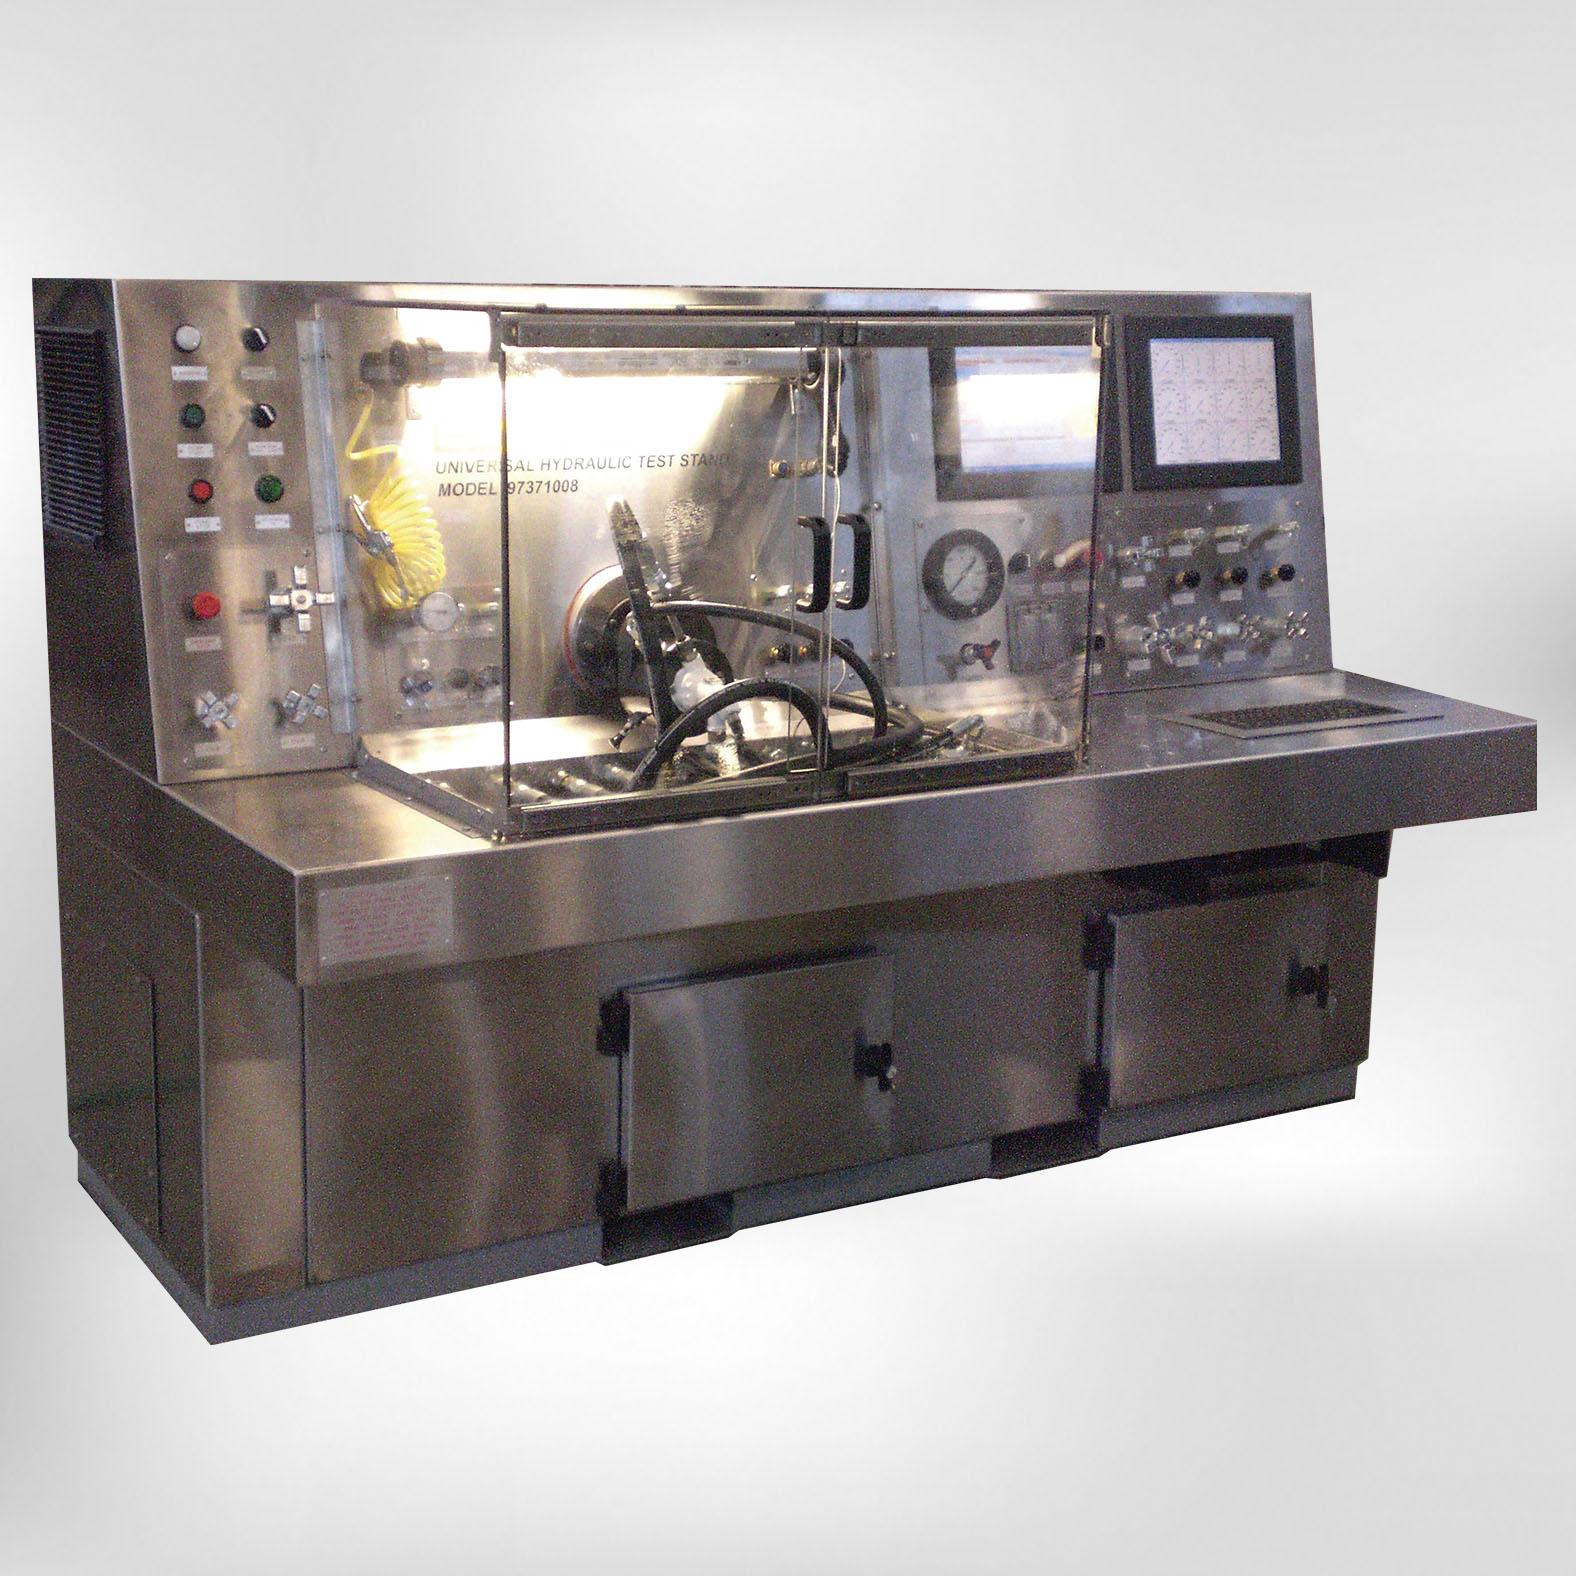 97371008 Universal Hydraulic Test Stand